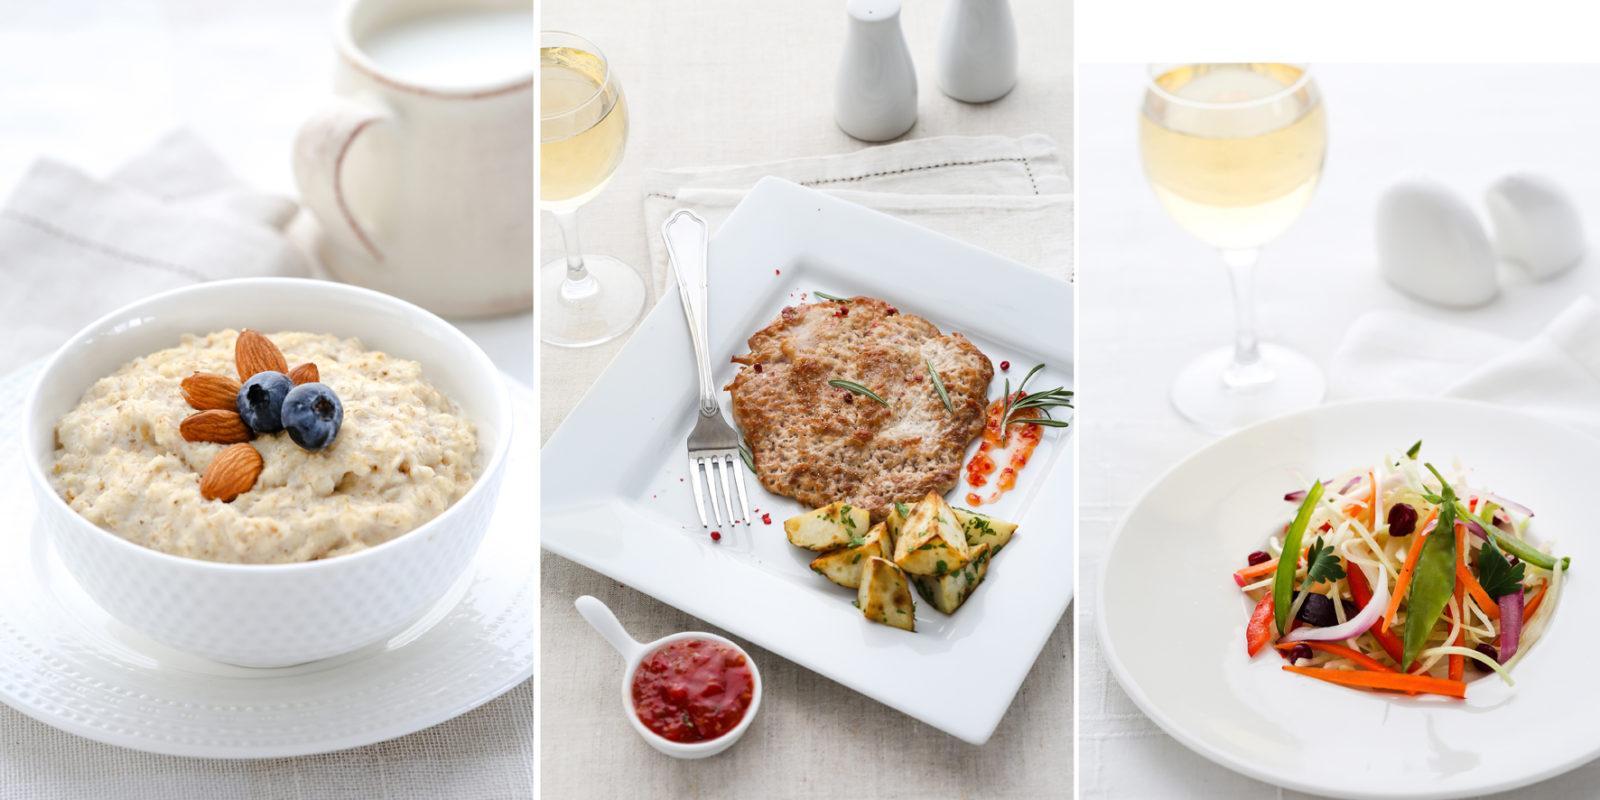 Как посуда влияет на вкус еды и ваш аппетит